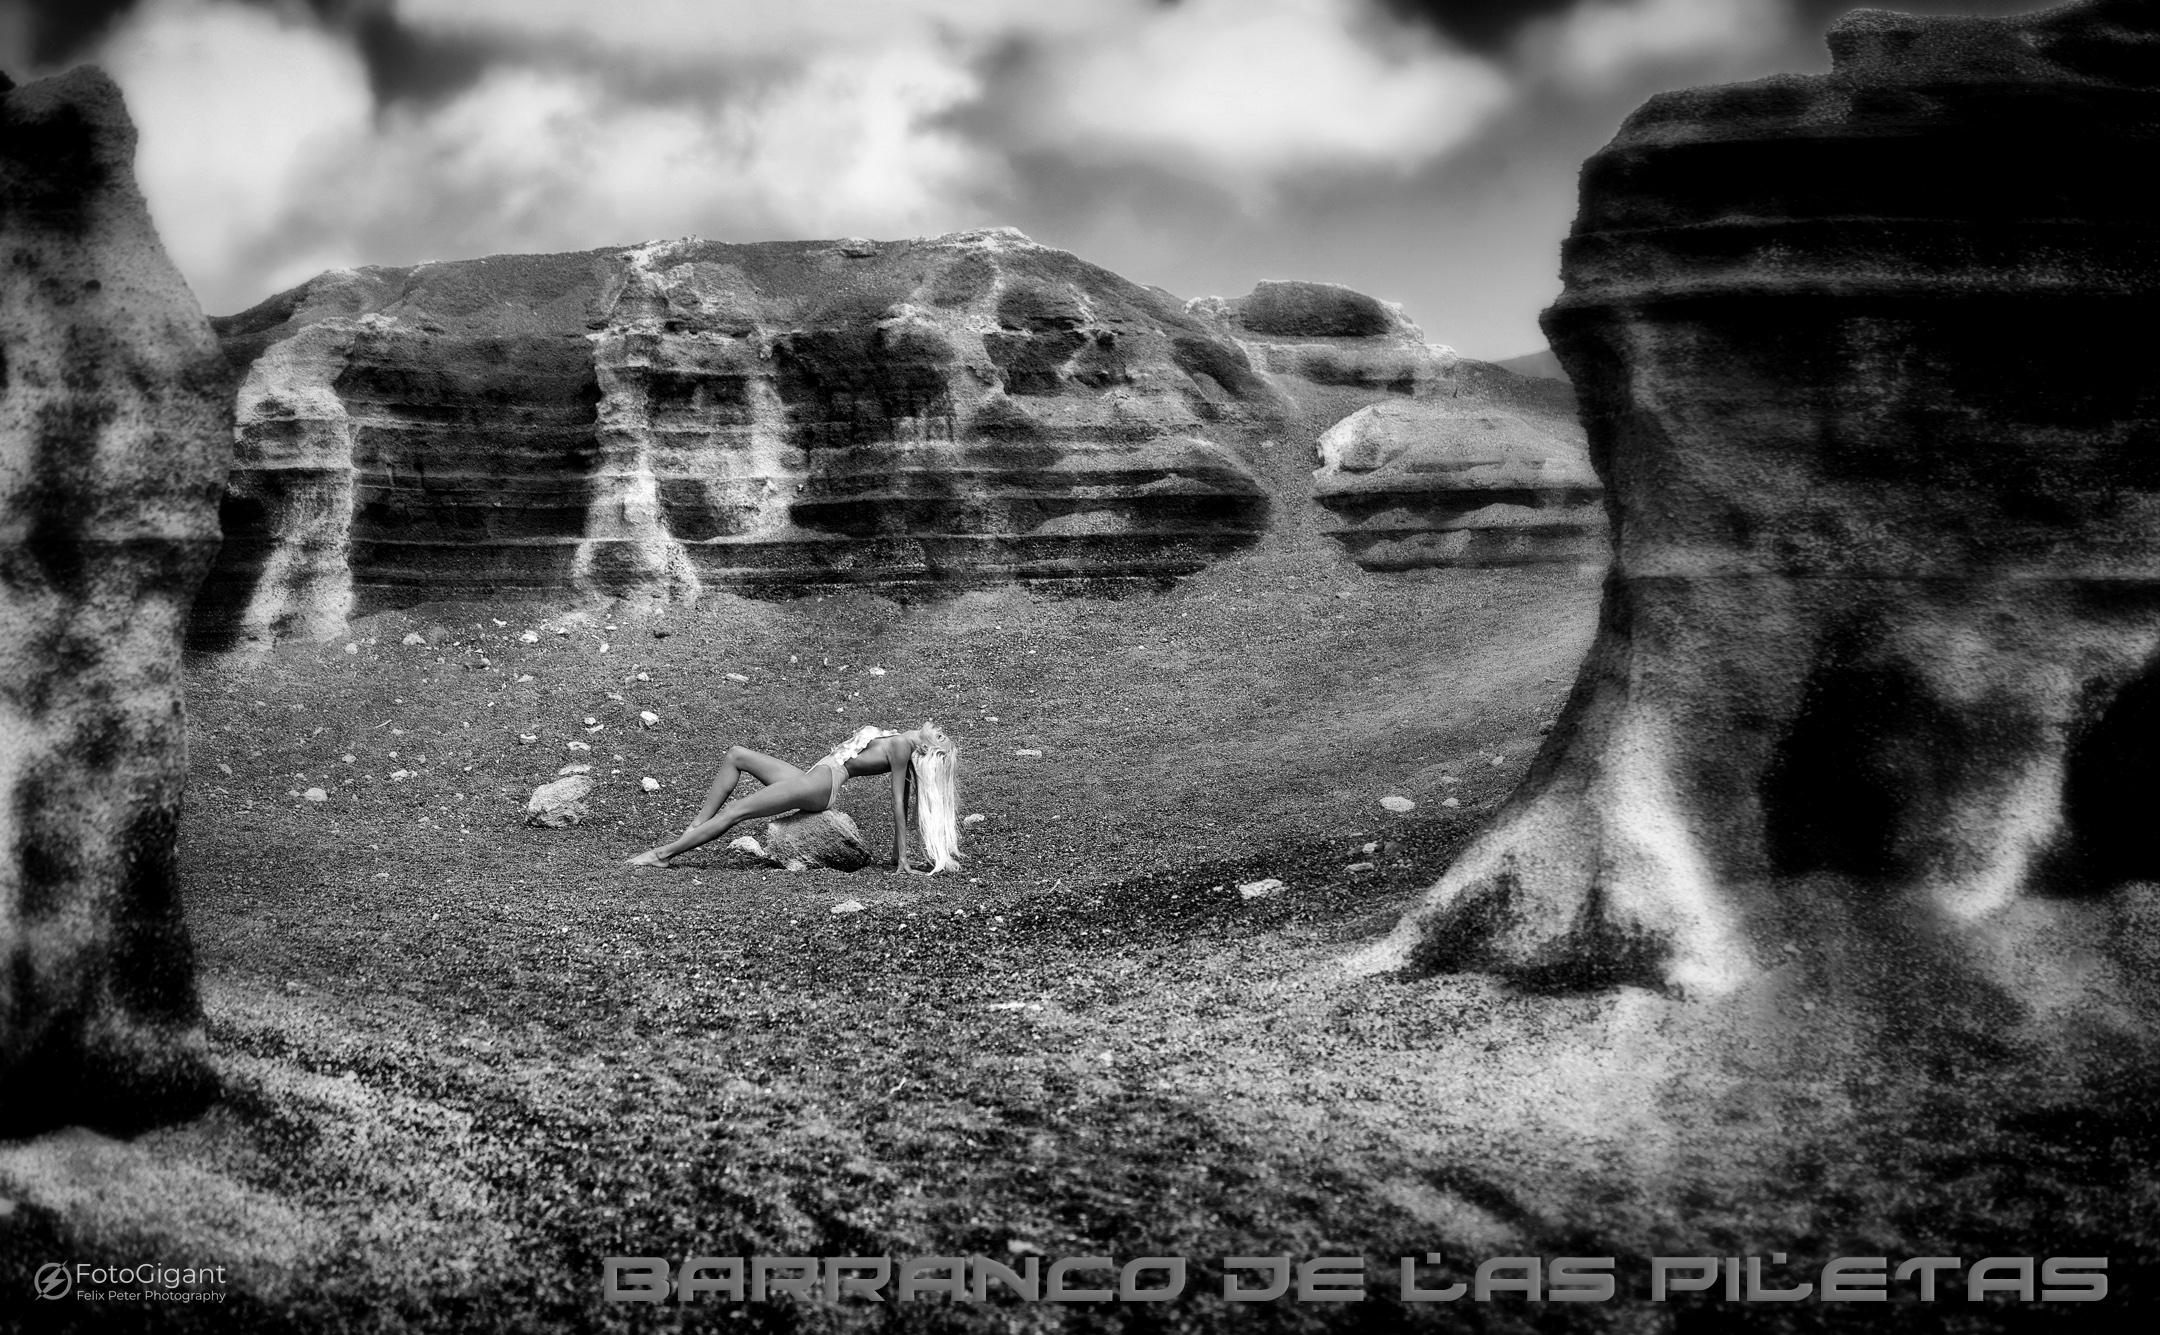 Lanzarote_NudeArt_Photoworkshop_FotoGigant_Switzerland_14.jpg